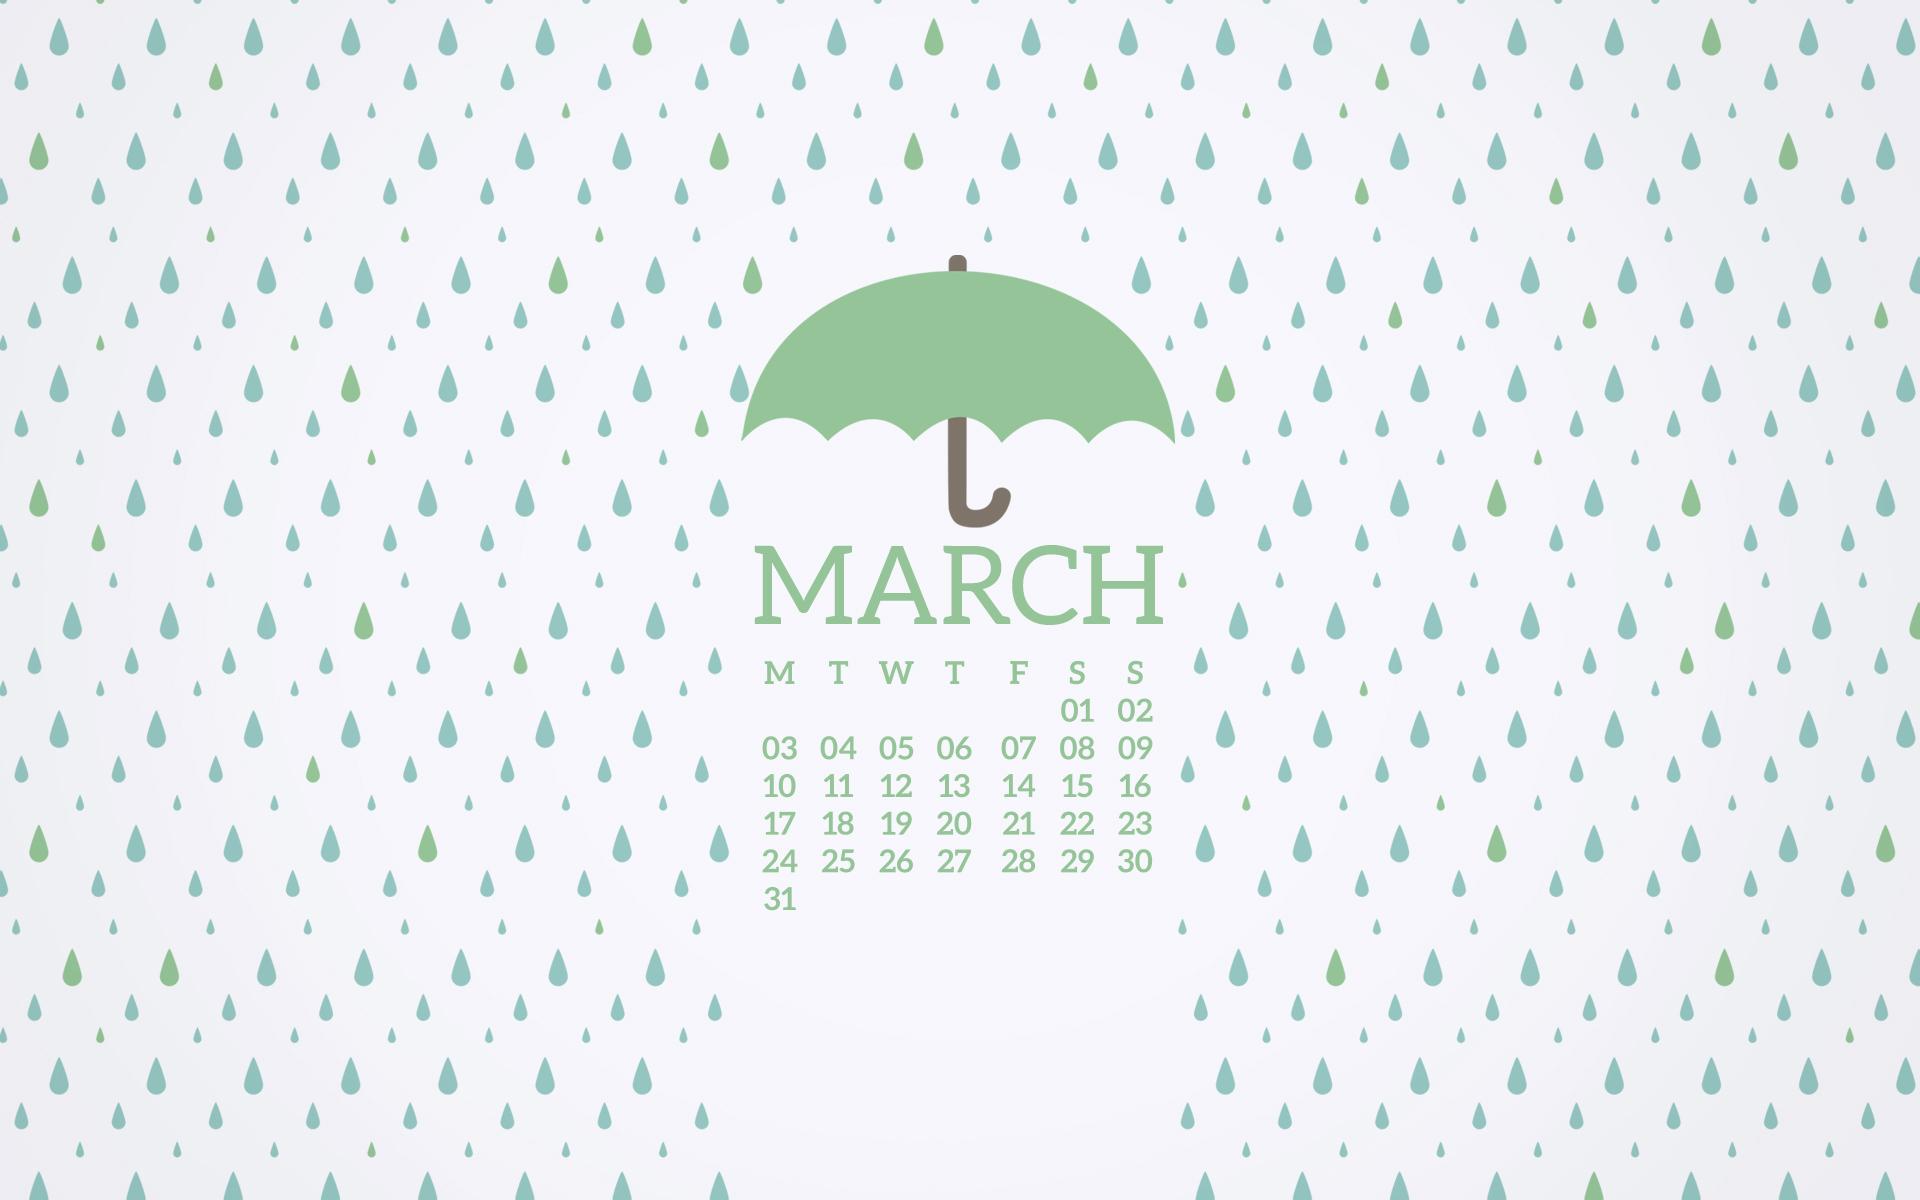 [%Download Rainy Desktop Wallpaper For March 2014 [1920X1200] | 49+|Free Desktop Calendar Wallpaper|Free Desktop Calendar Wallpaper%]